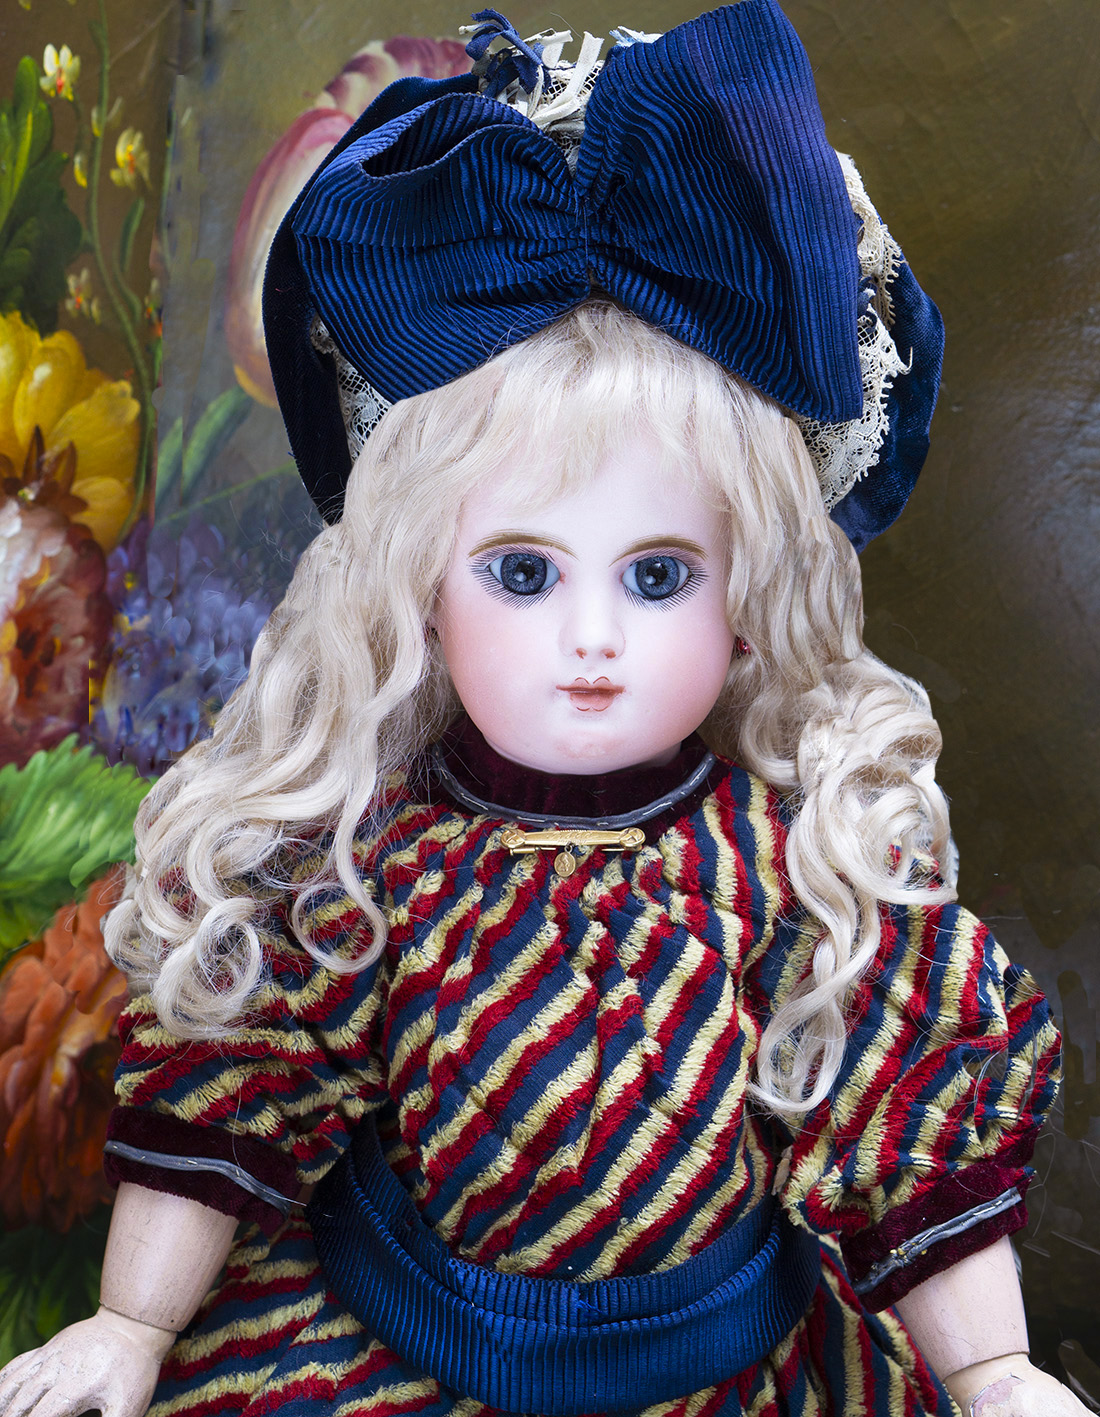 51см Редкая Французская кукла Bebe Mascotte компании MAY FRERES